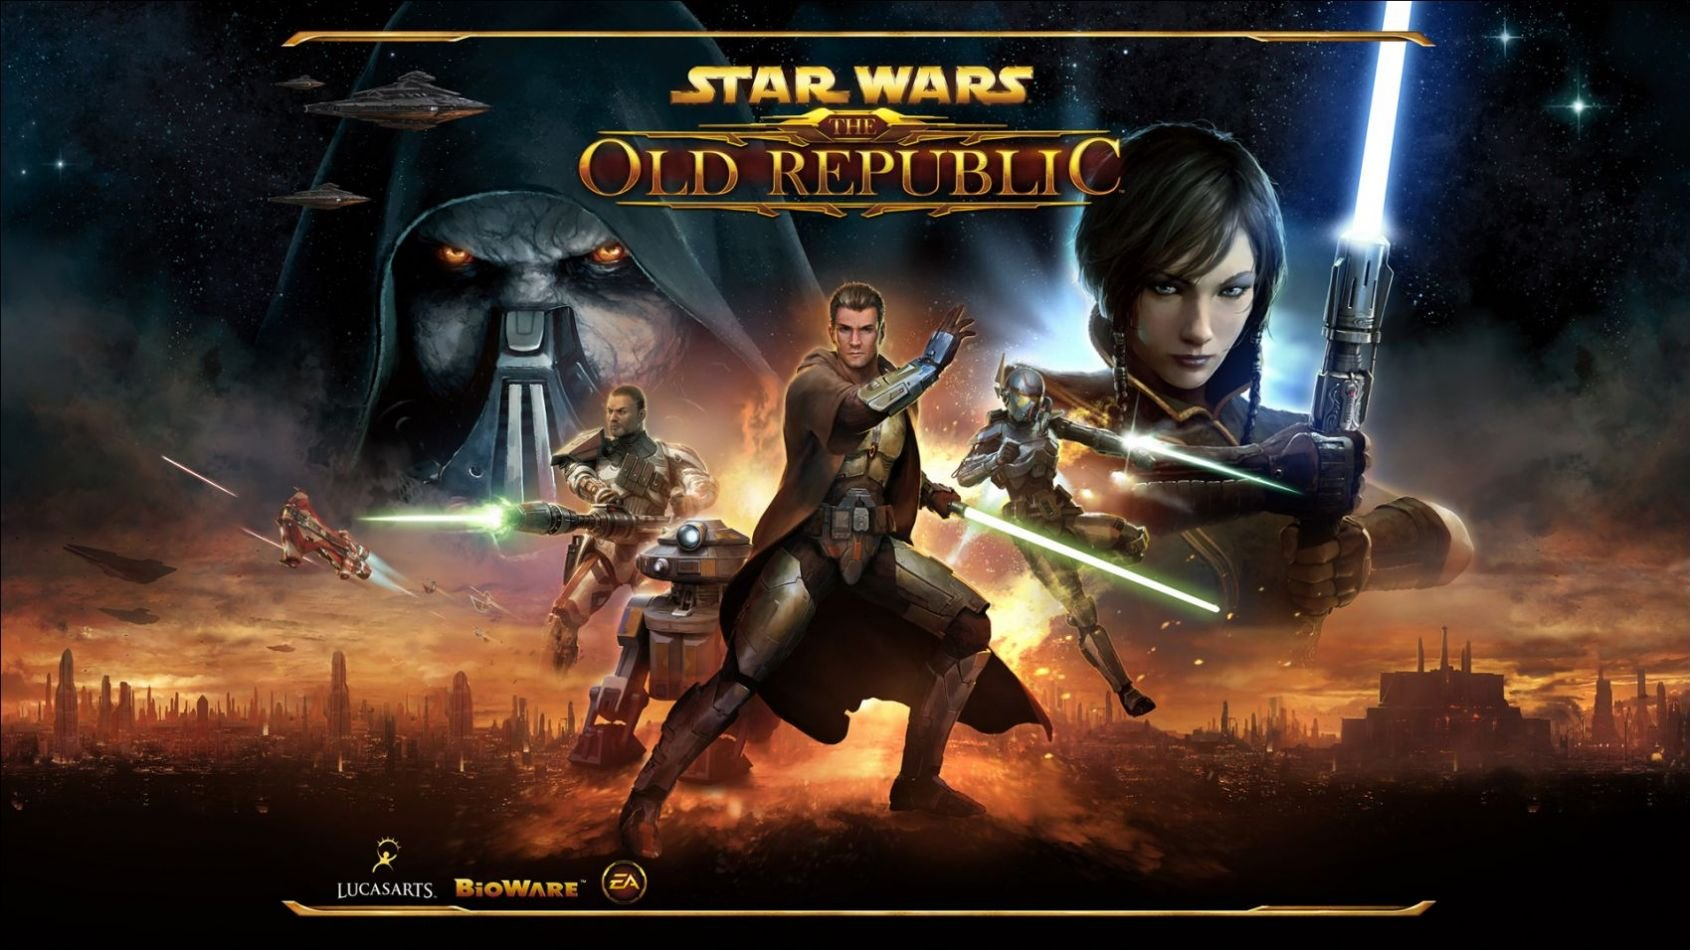 Star Wars The Old Republic, le teaser de : Crise sur Umbara